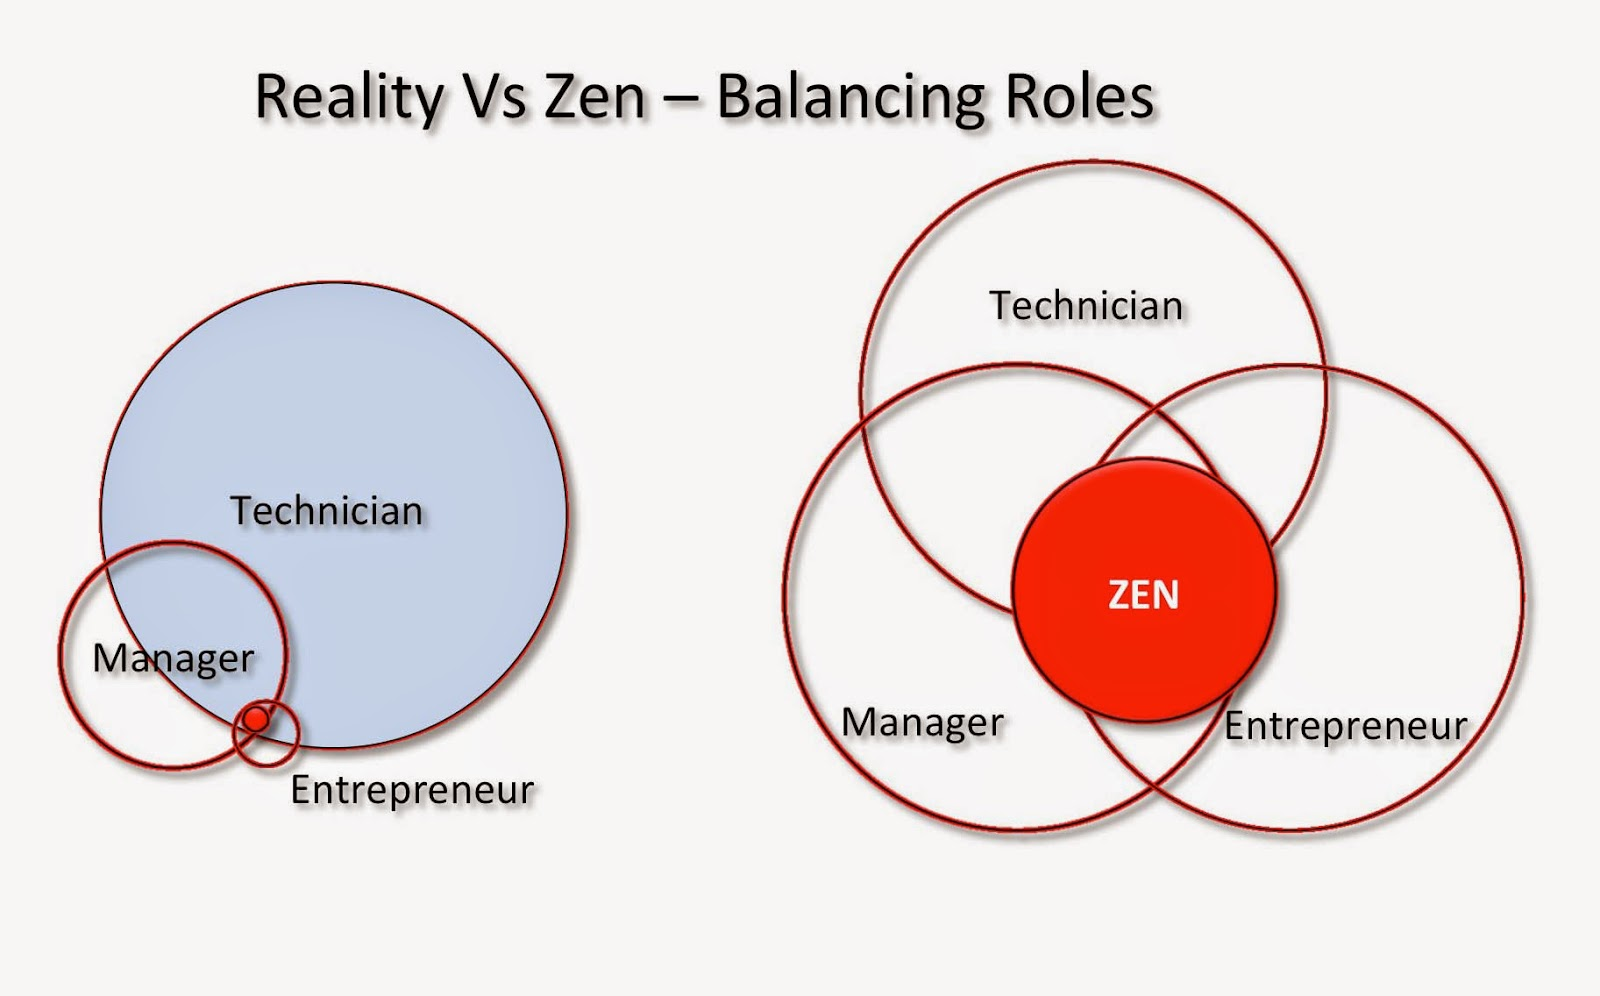 Дзэн бизнесмена: интеграция ролей специалиста, менеджера, предпринимателя